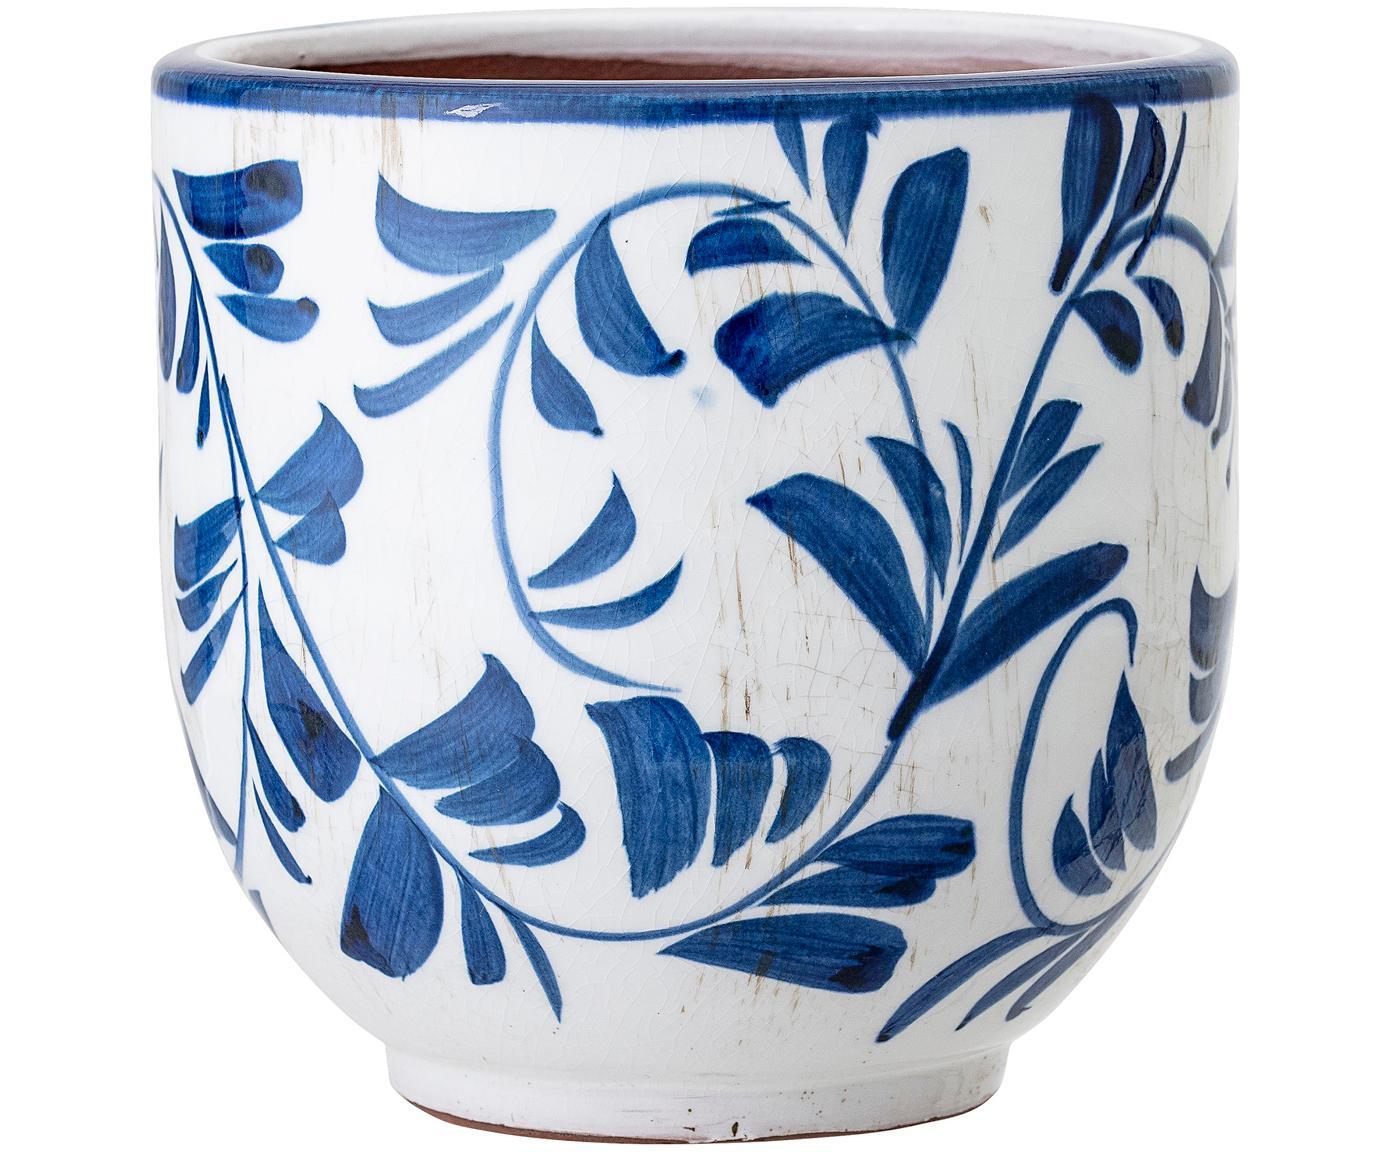 Portavaso Jarl, Terracotta, Blu, bianco, Ø 14 x Alt. 14 cm